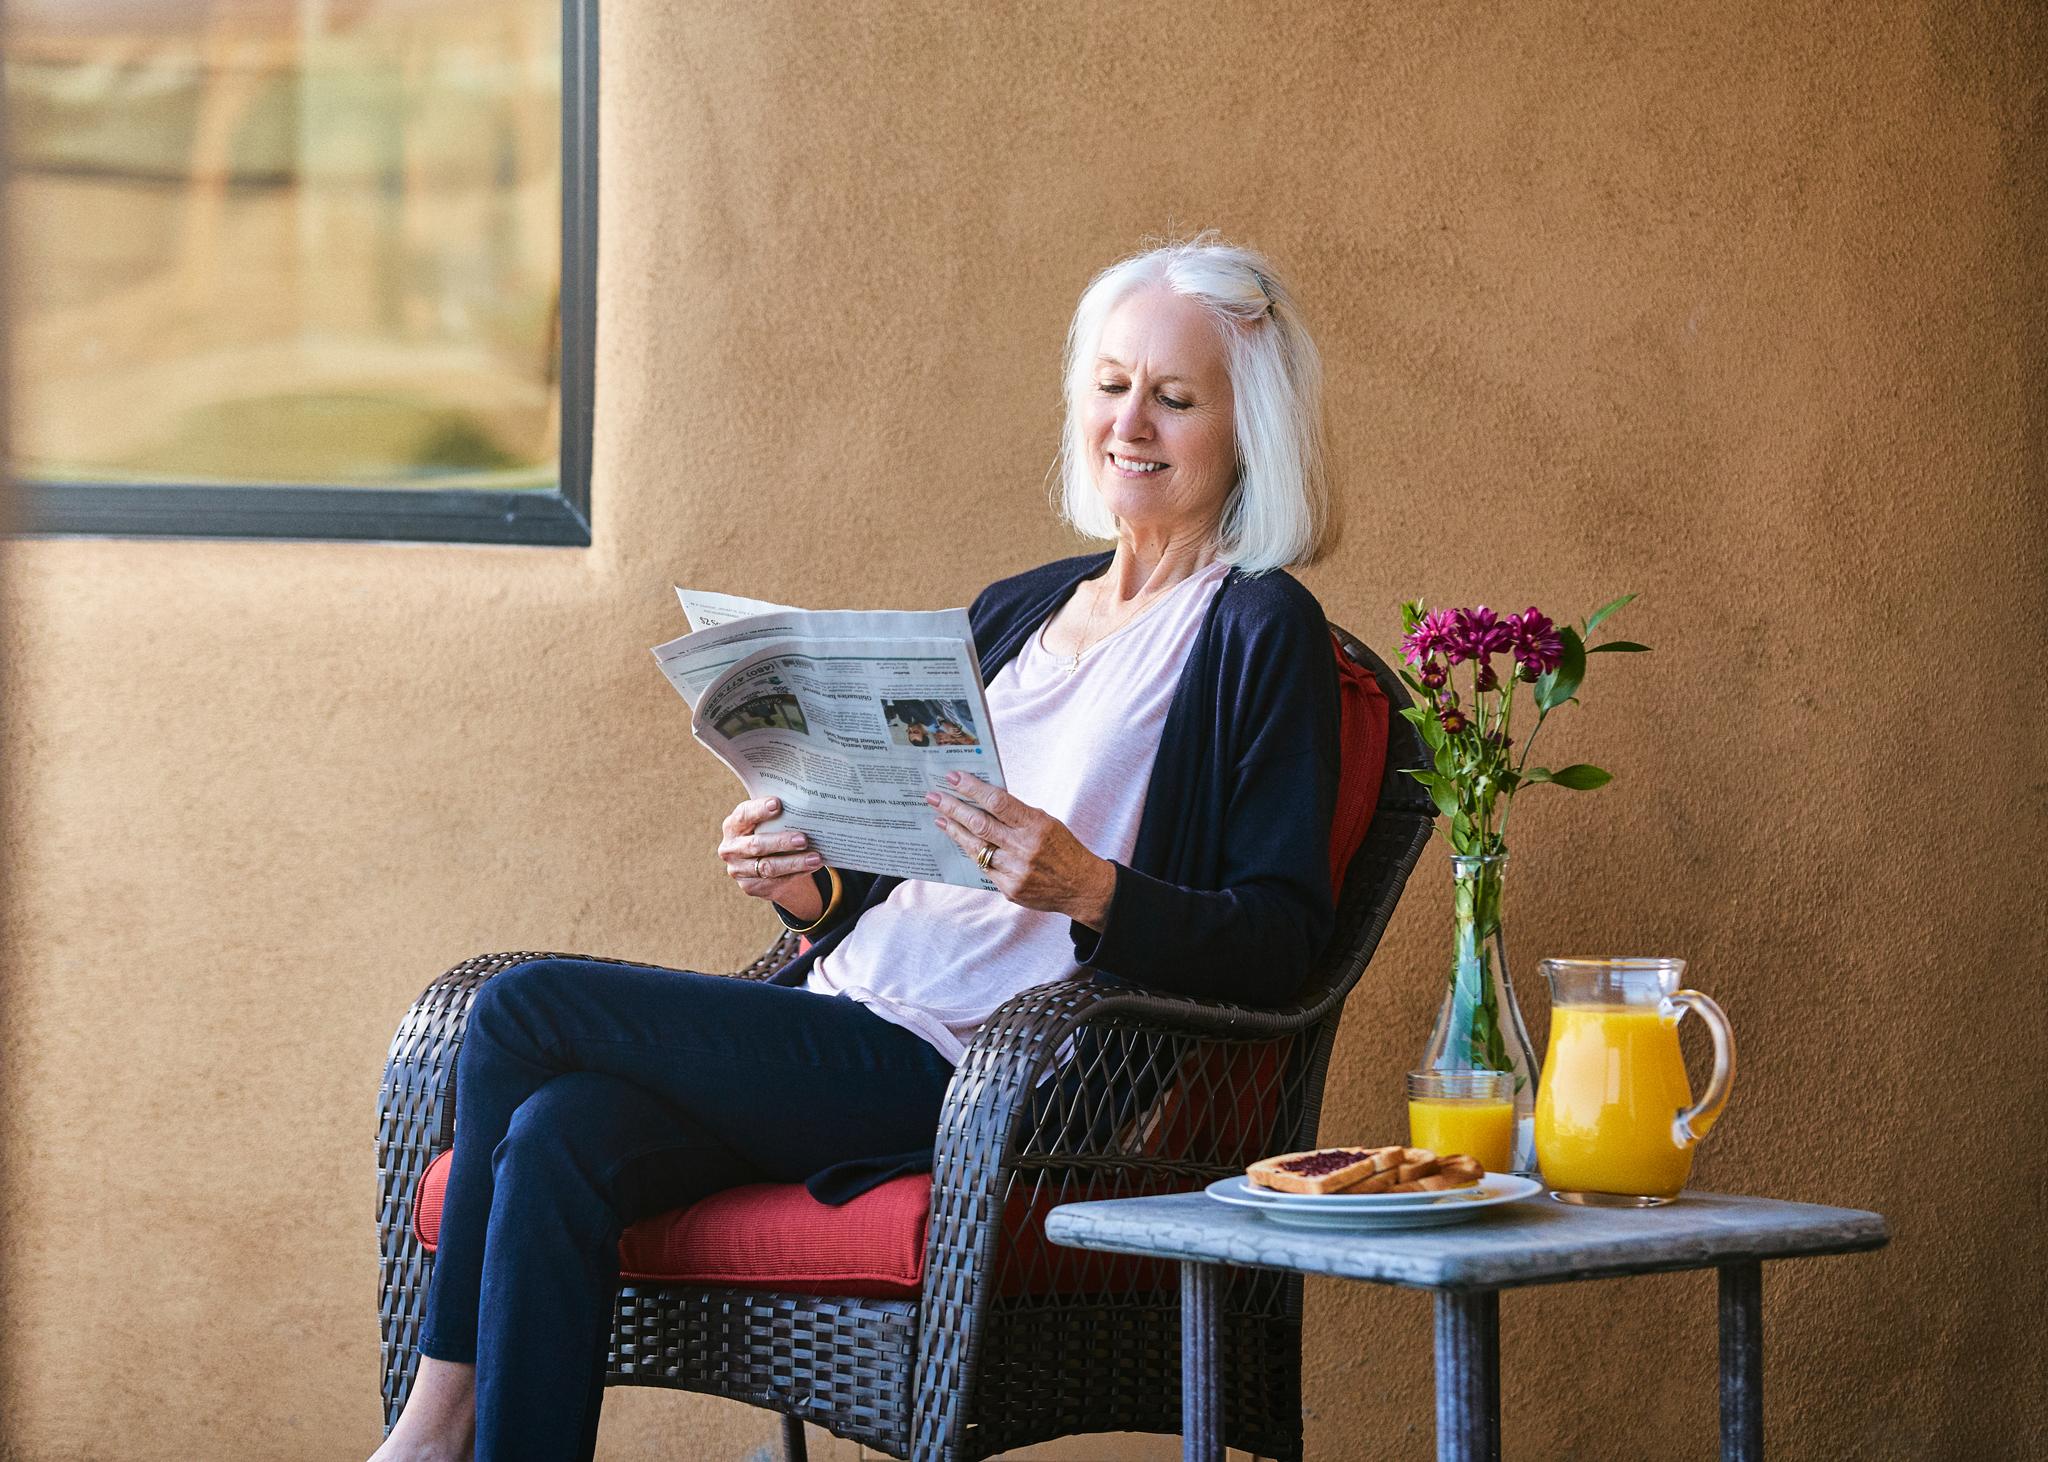 Commercial-Photographer-Brandon_Tigrett_Abellavida-lifestyle-breakfast-patio-1